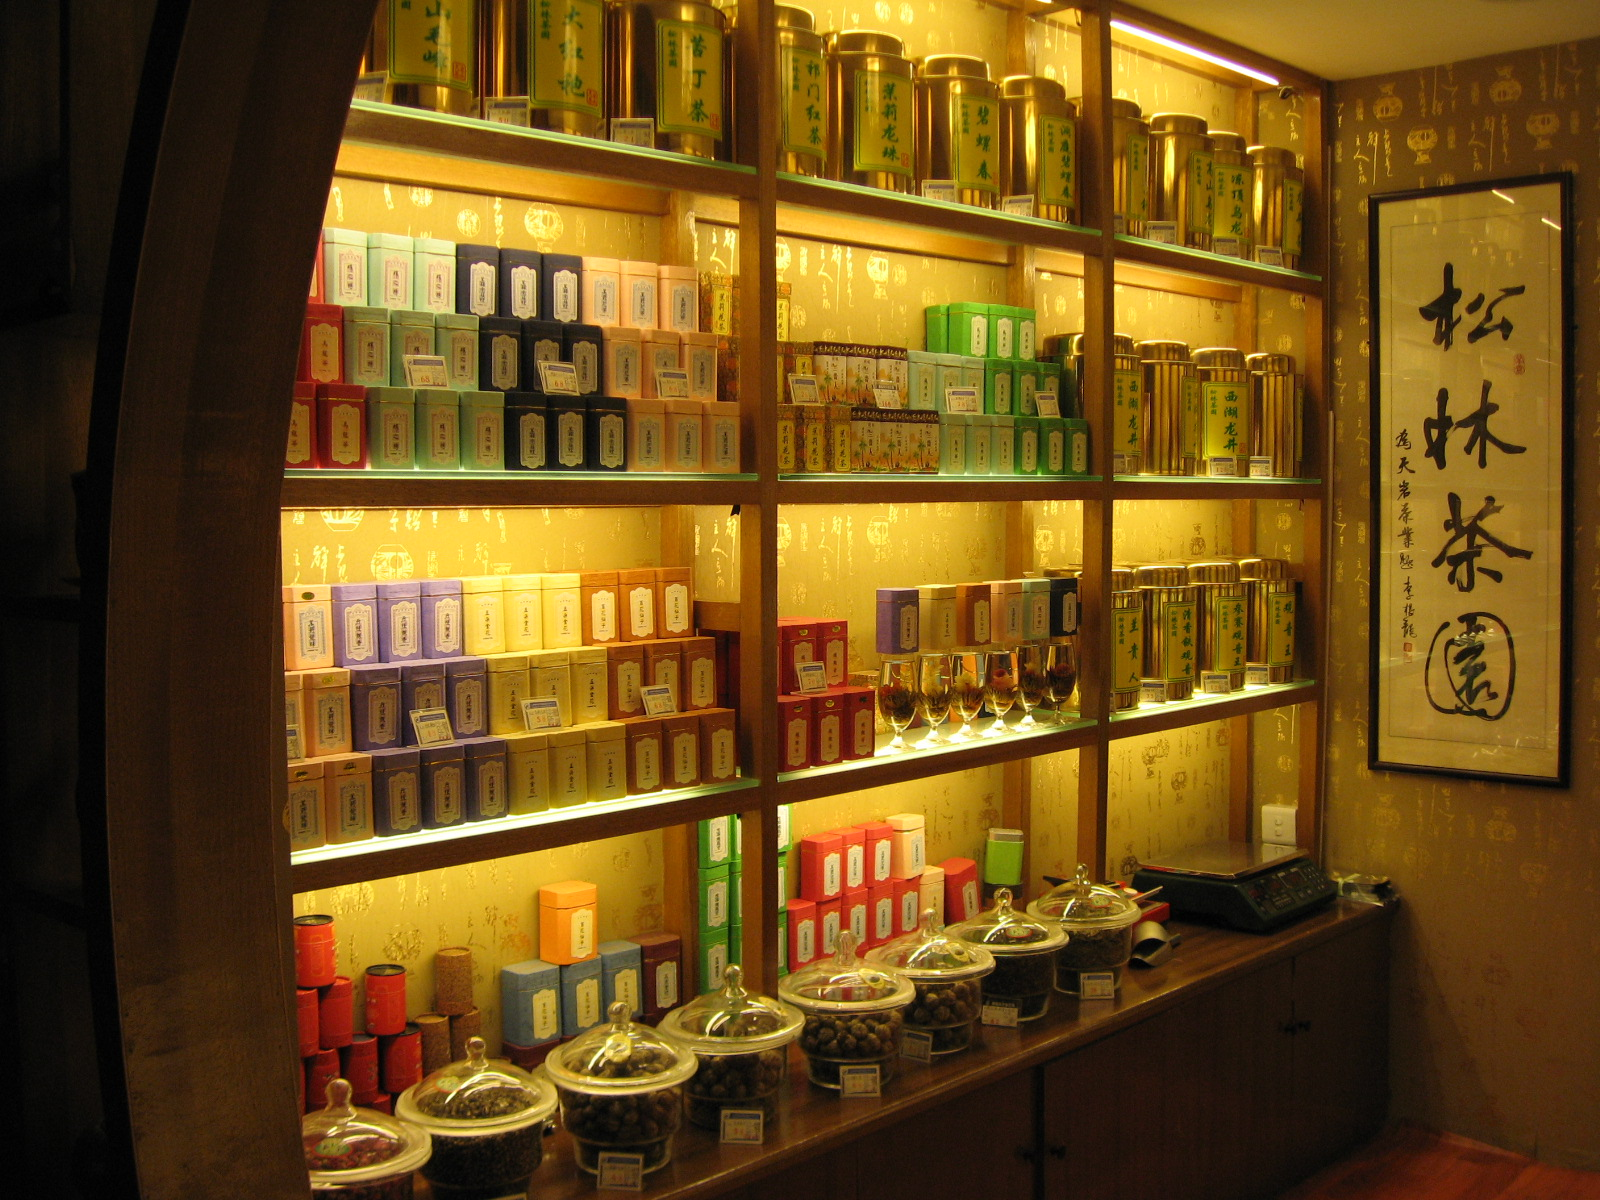 Franquicia Tea Shop - Ideas De Disenos - Ciboney.net